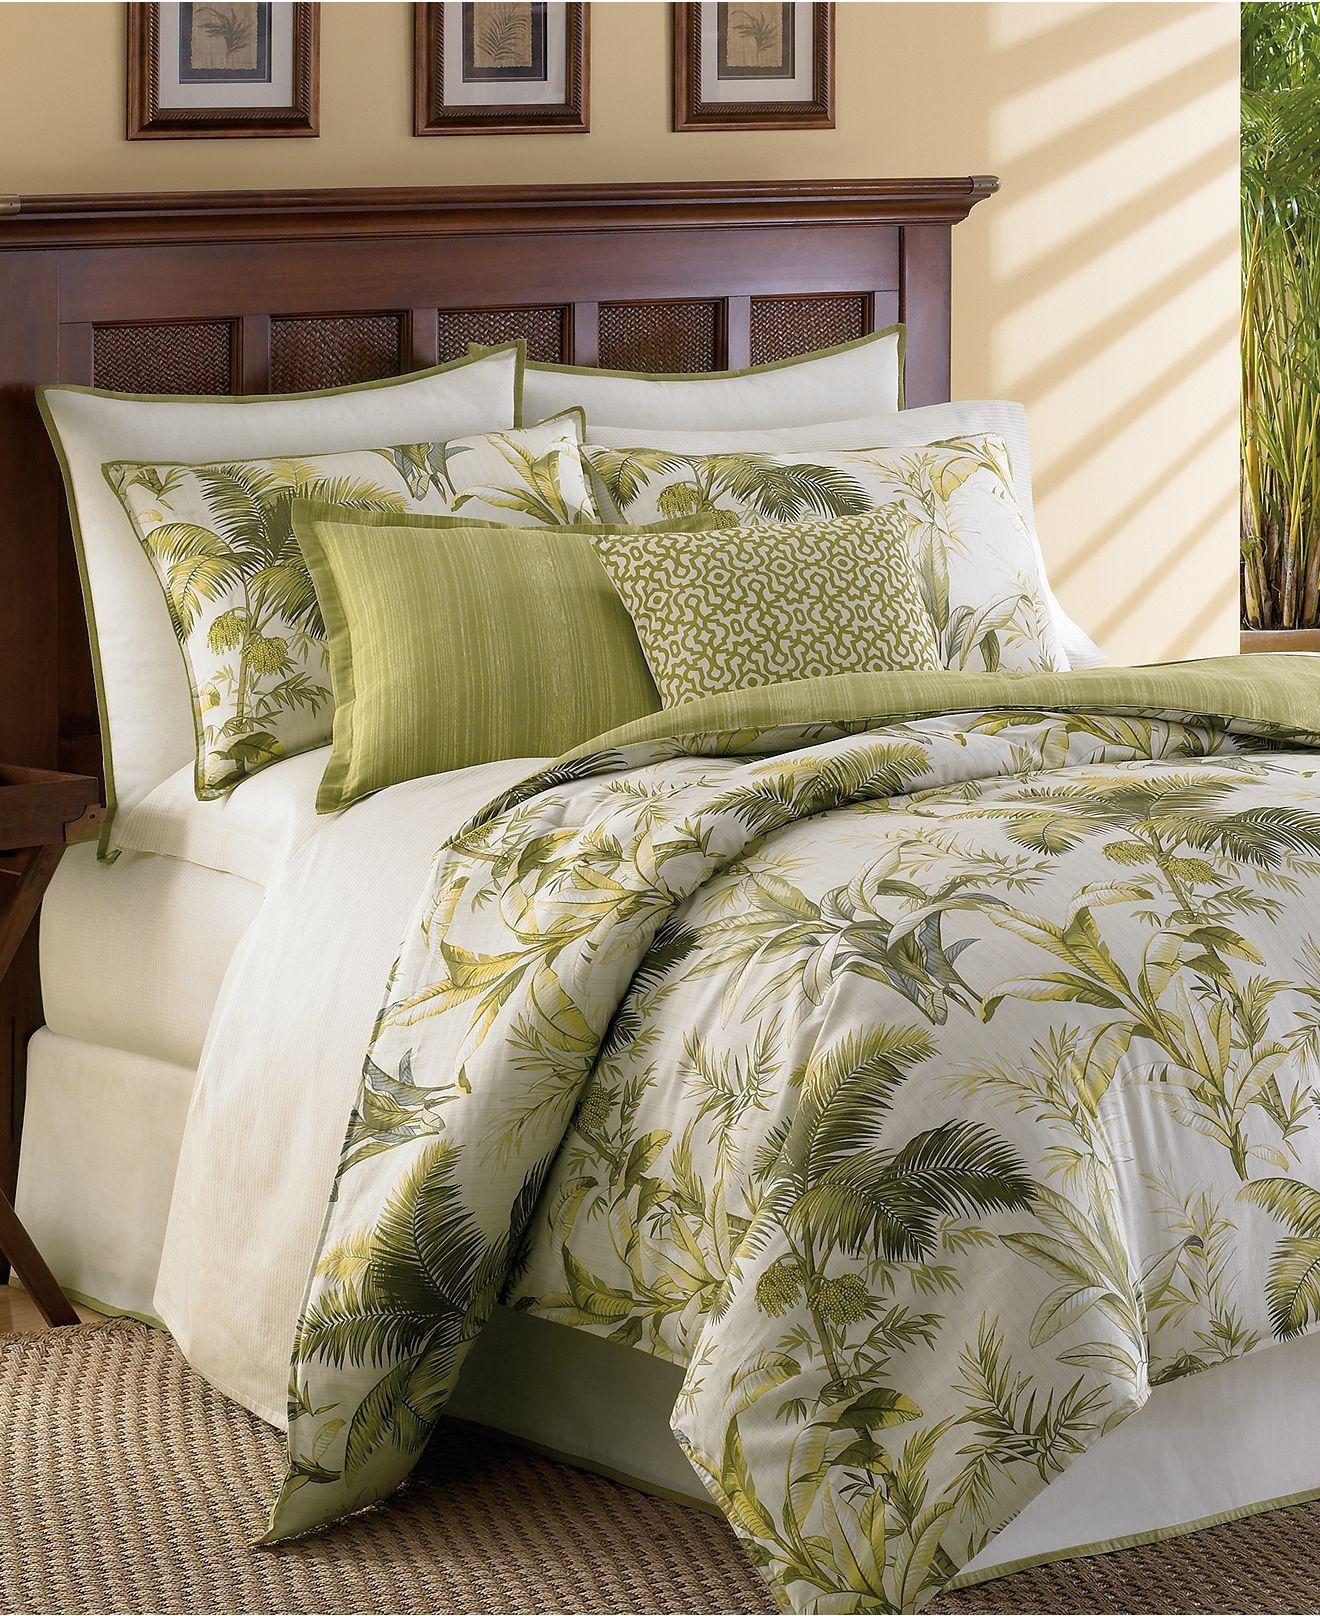 Green foliage bedspread.m Botanical bedroom, Tropical